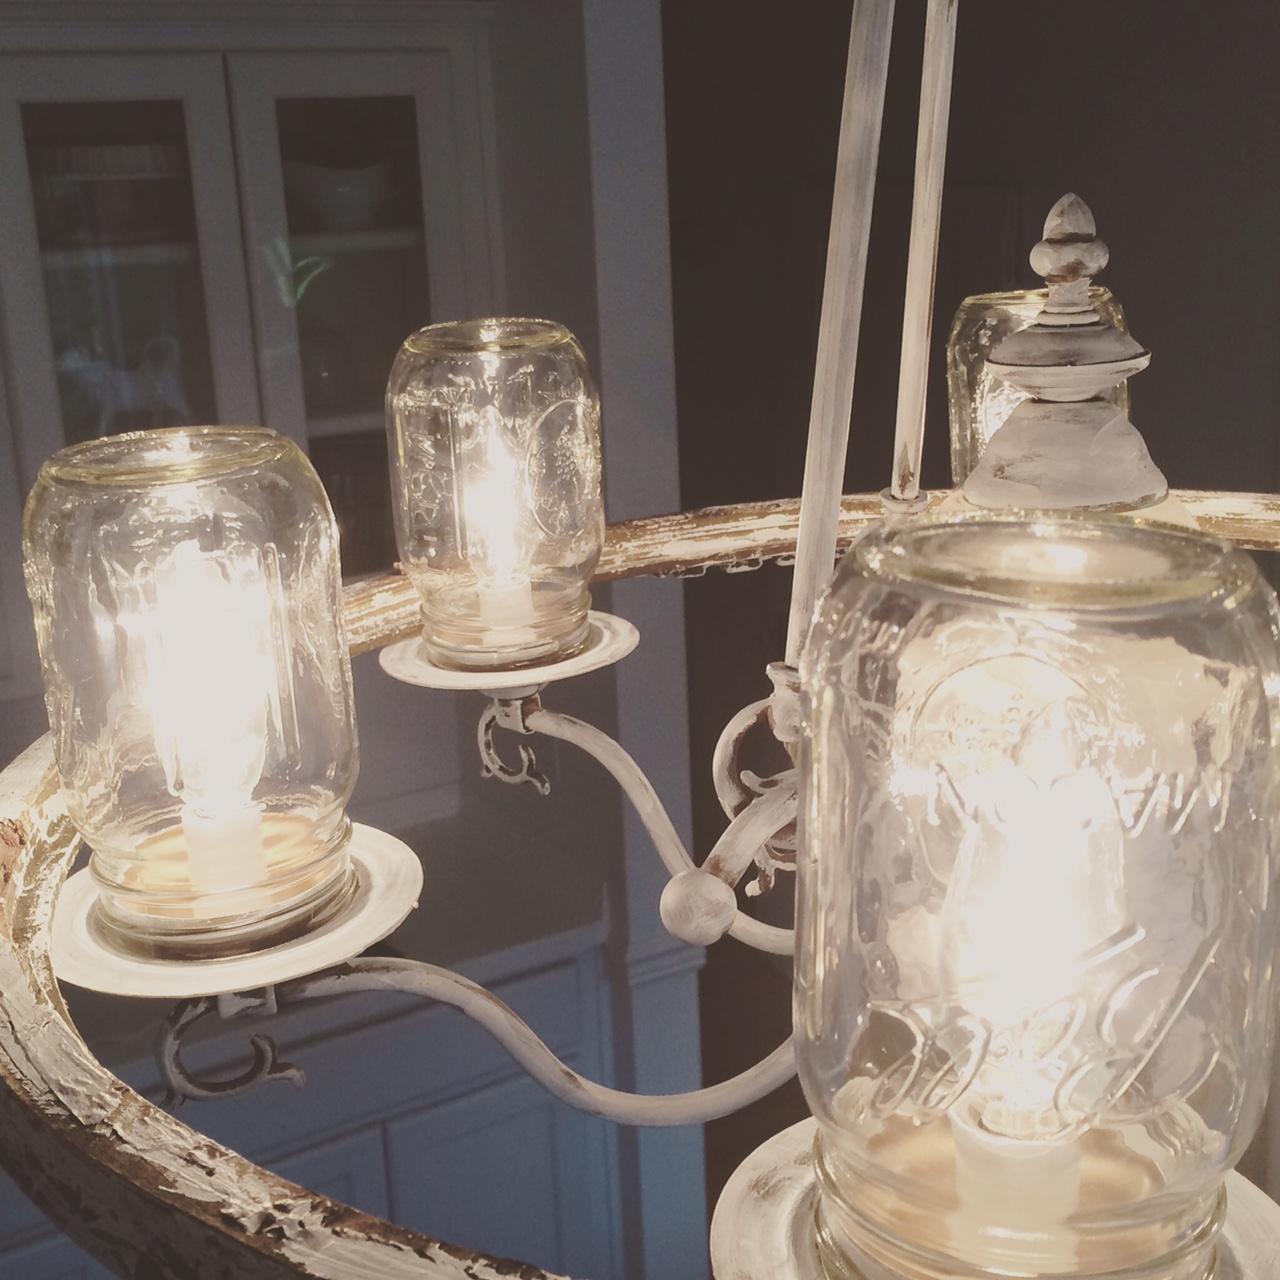 Mason Jar Chandelier: Little Farmstead: A Mason Jar Chandelier Makeover